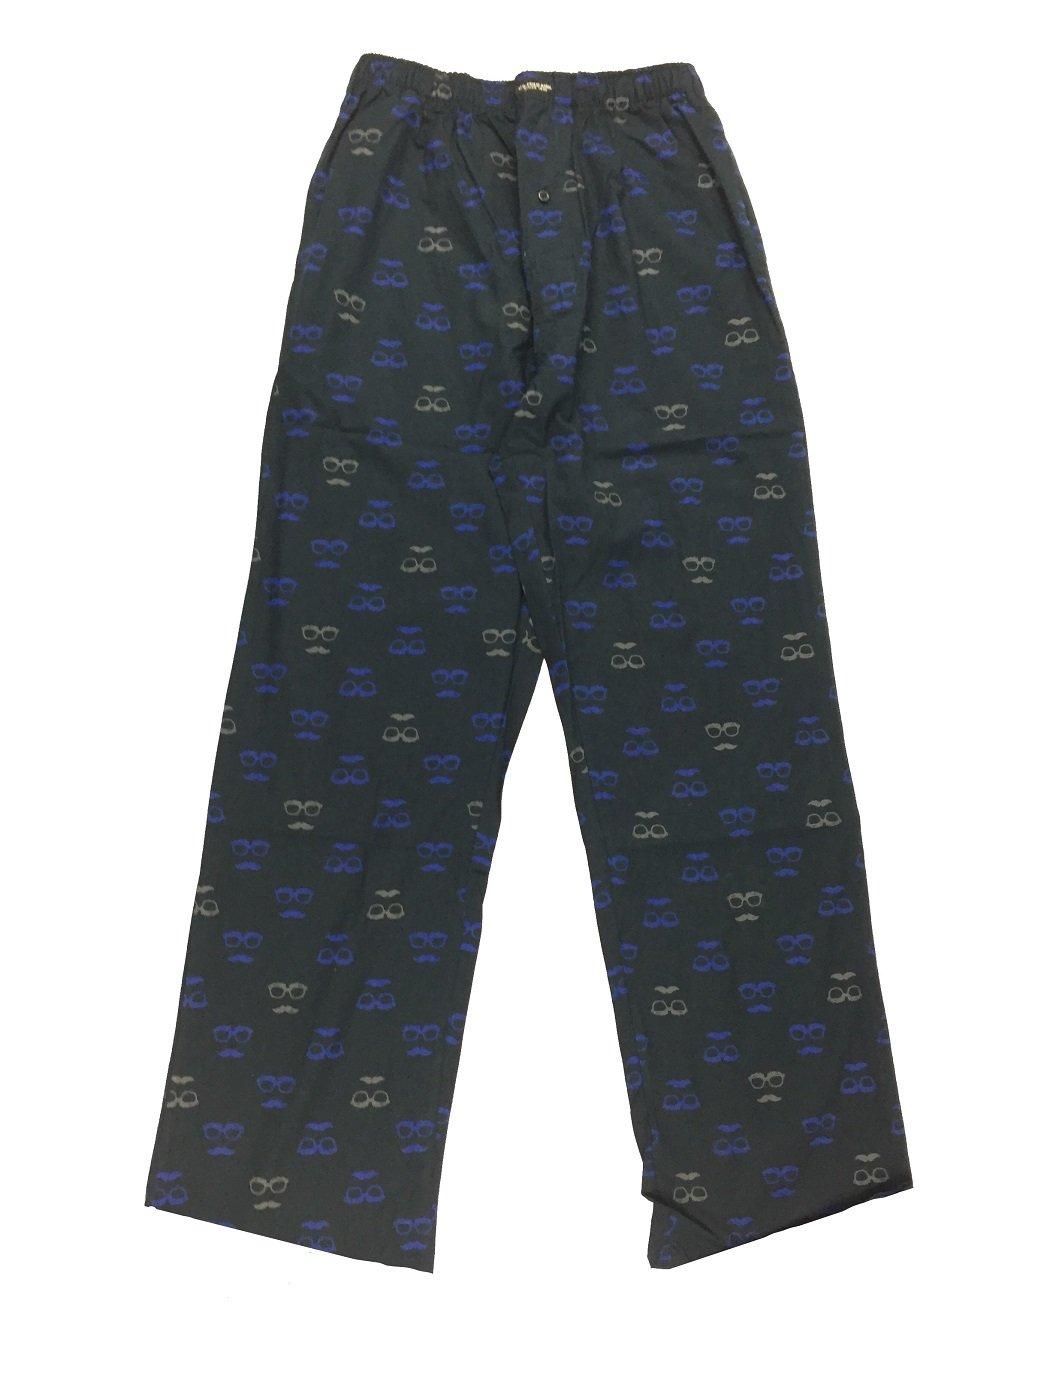 U.S. Polo Assn. Men's Sleepwear Cotton Lounge Pajama Pant (Black with Glasses, XL) (Black with Glasses, S)